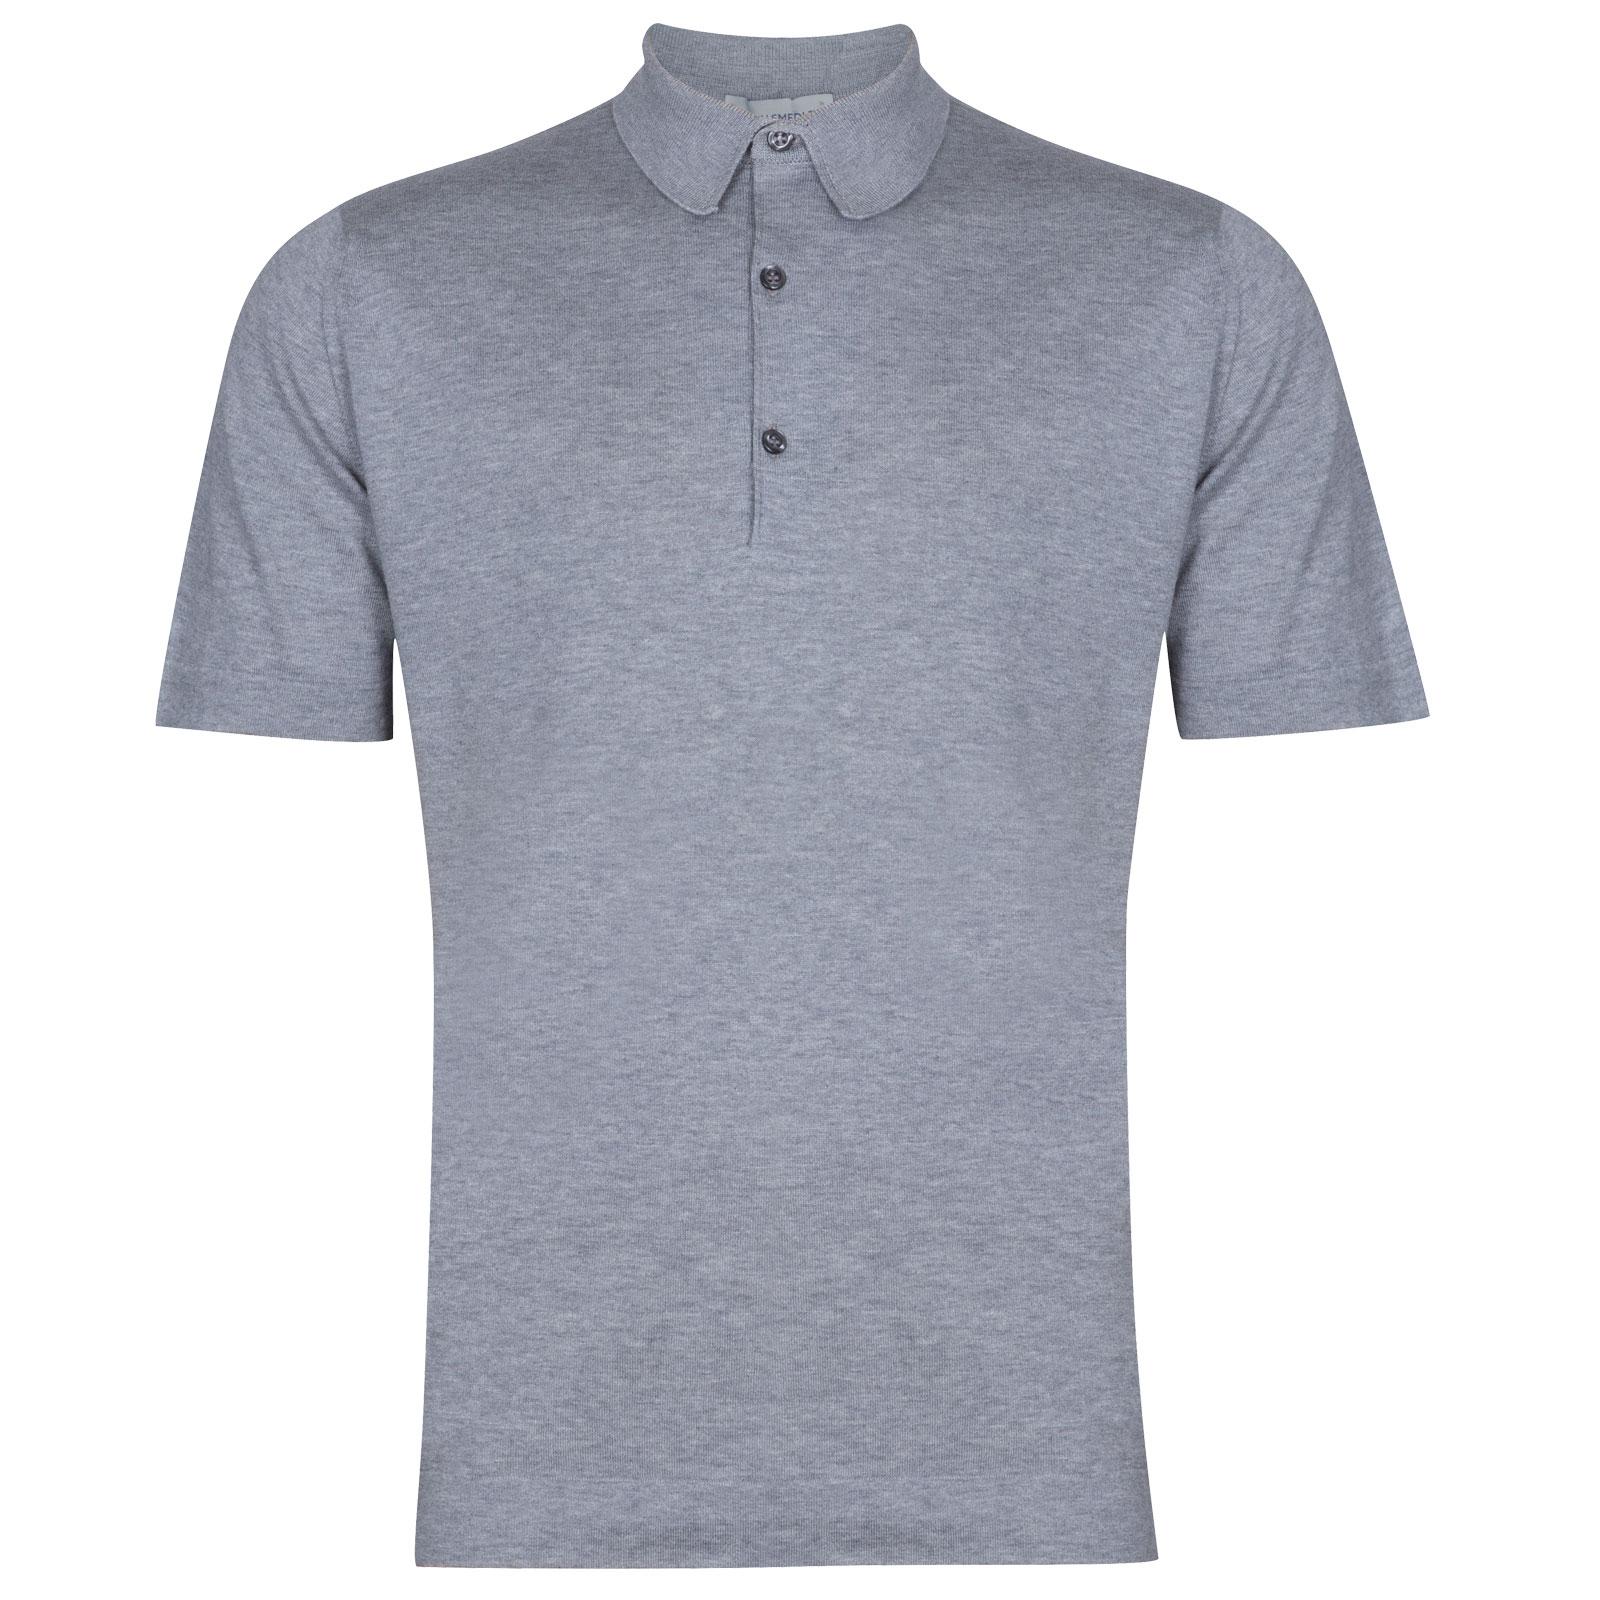 John Smedley Mycroft in Silver Shirt-XLG